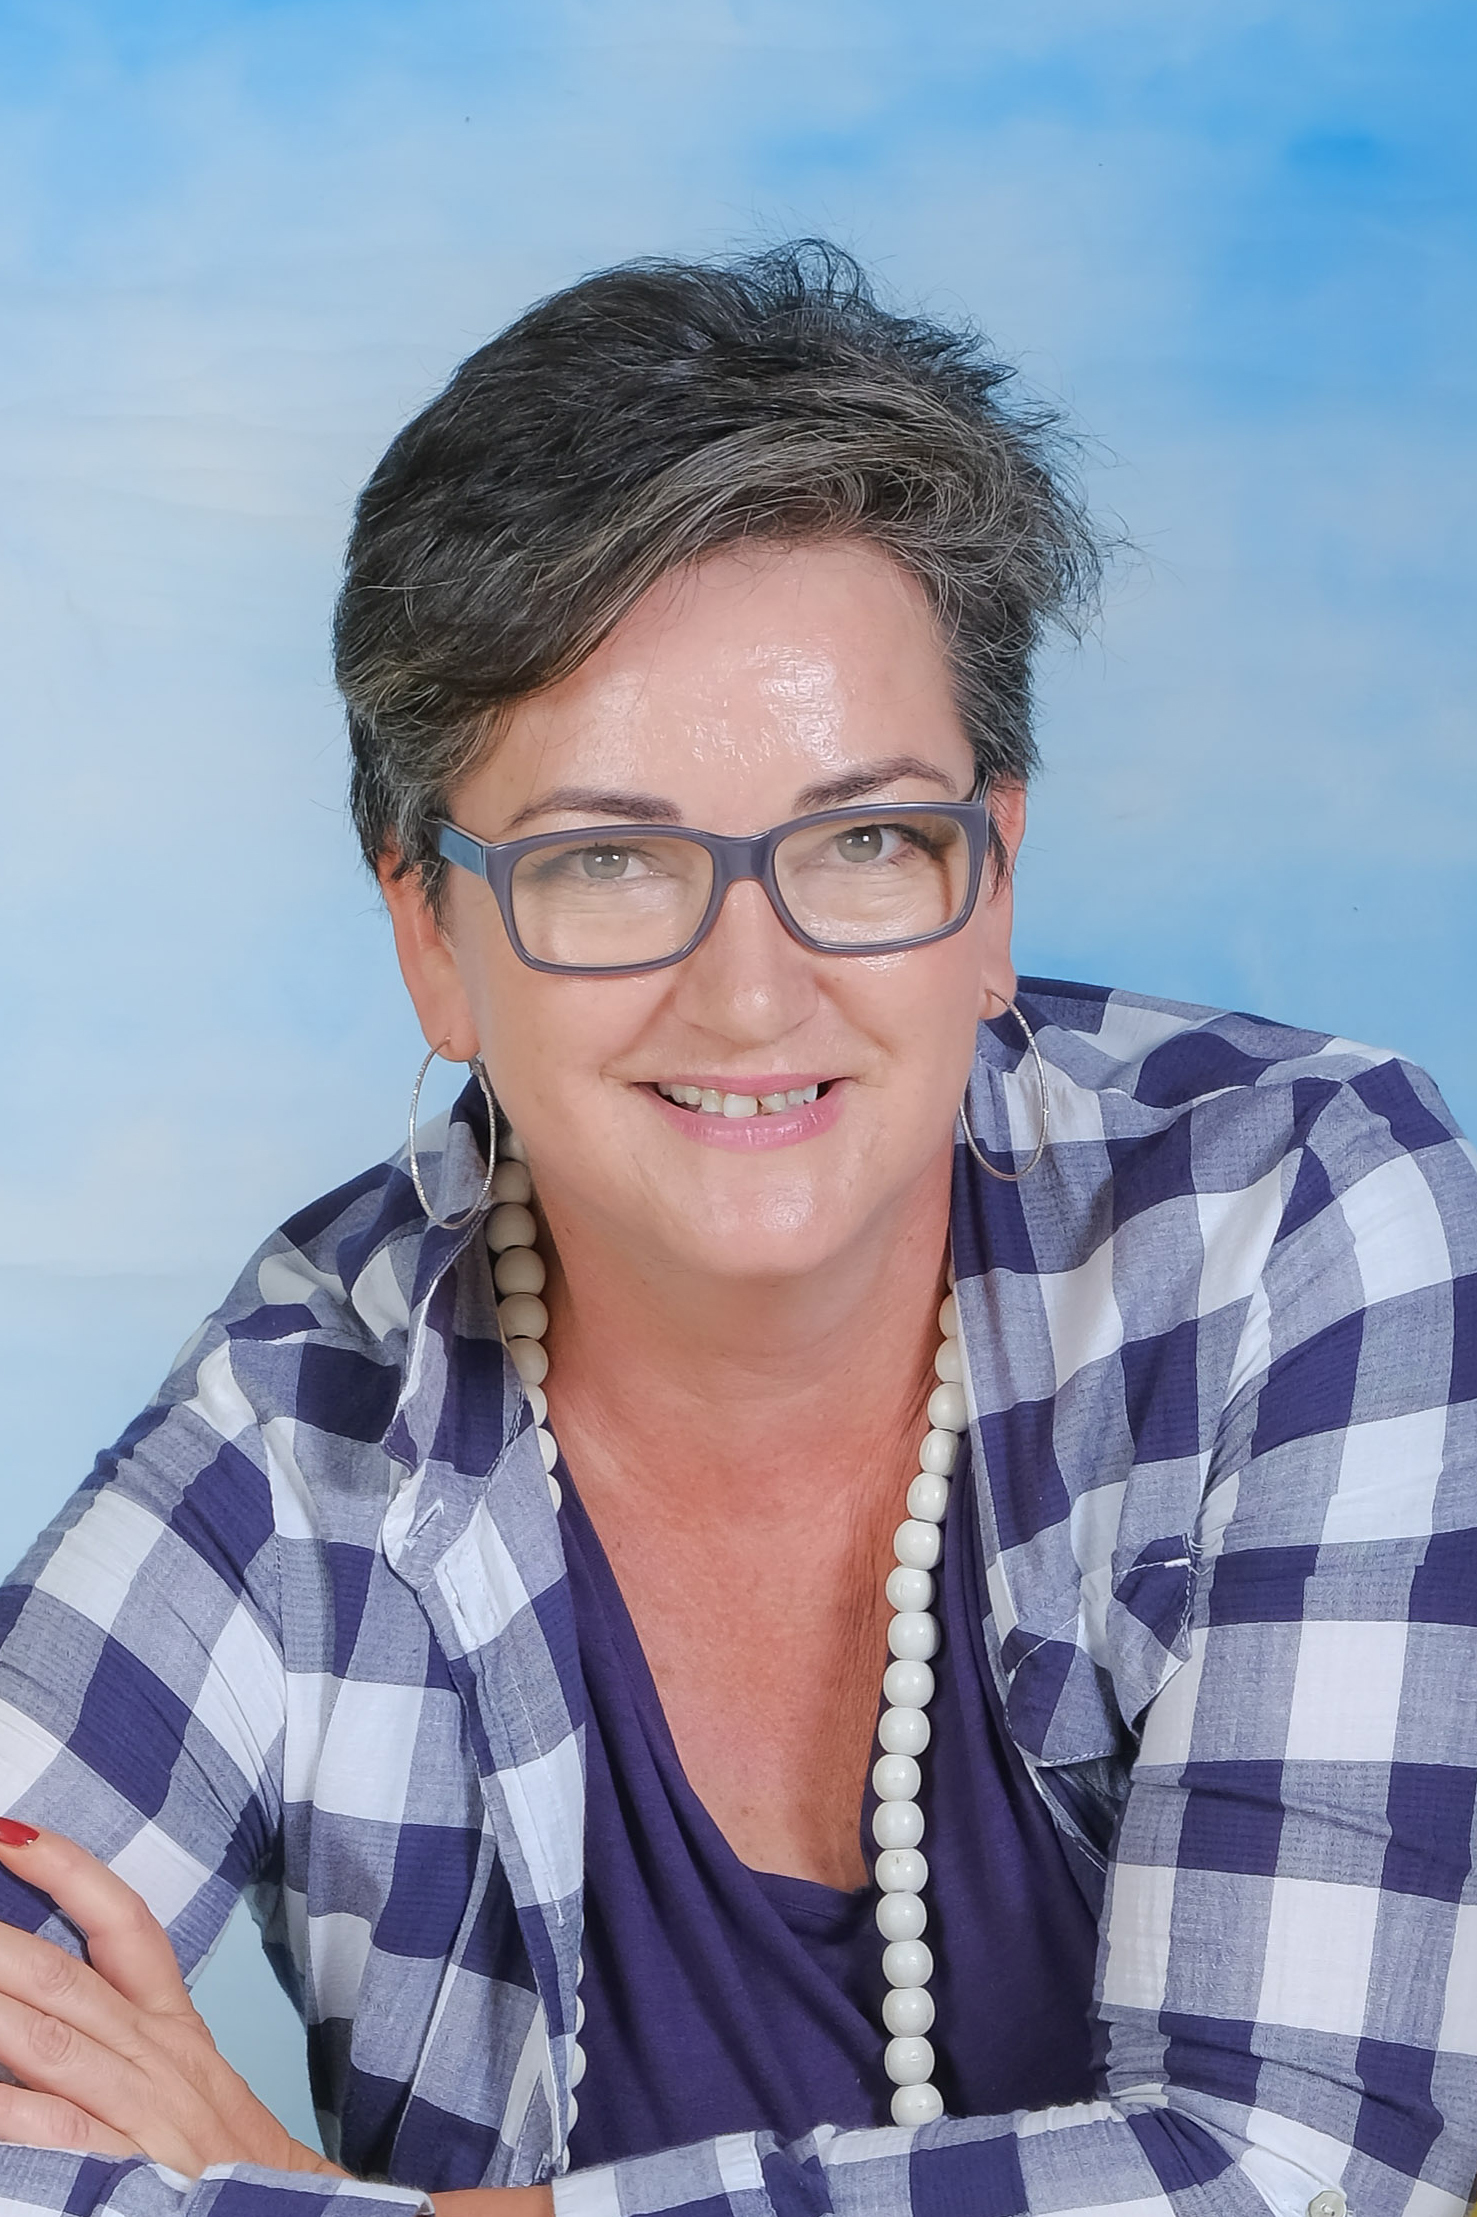 Bakkermiere-Lizelle-Kruger-lizel@nellies.co.za